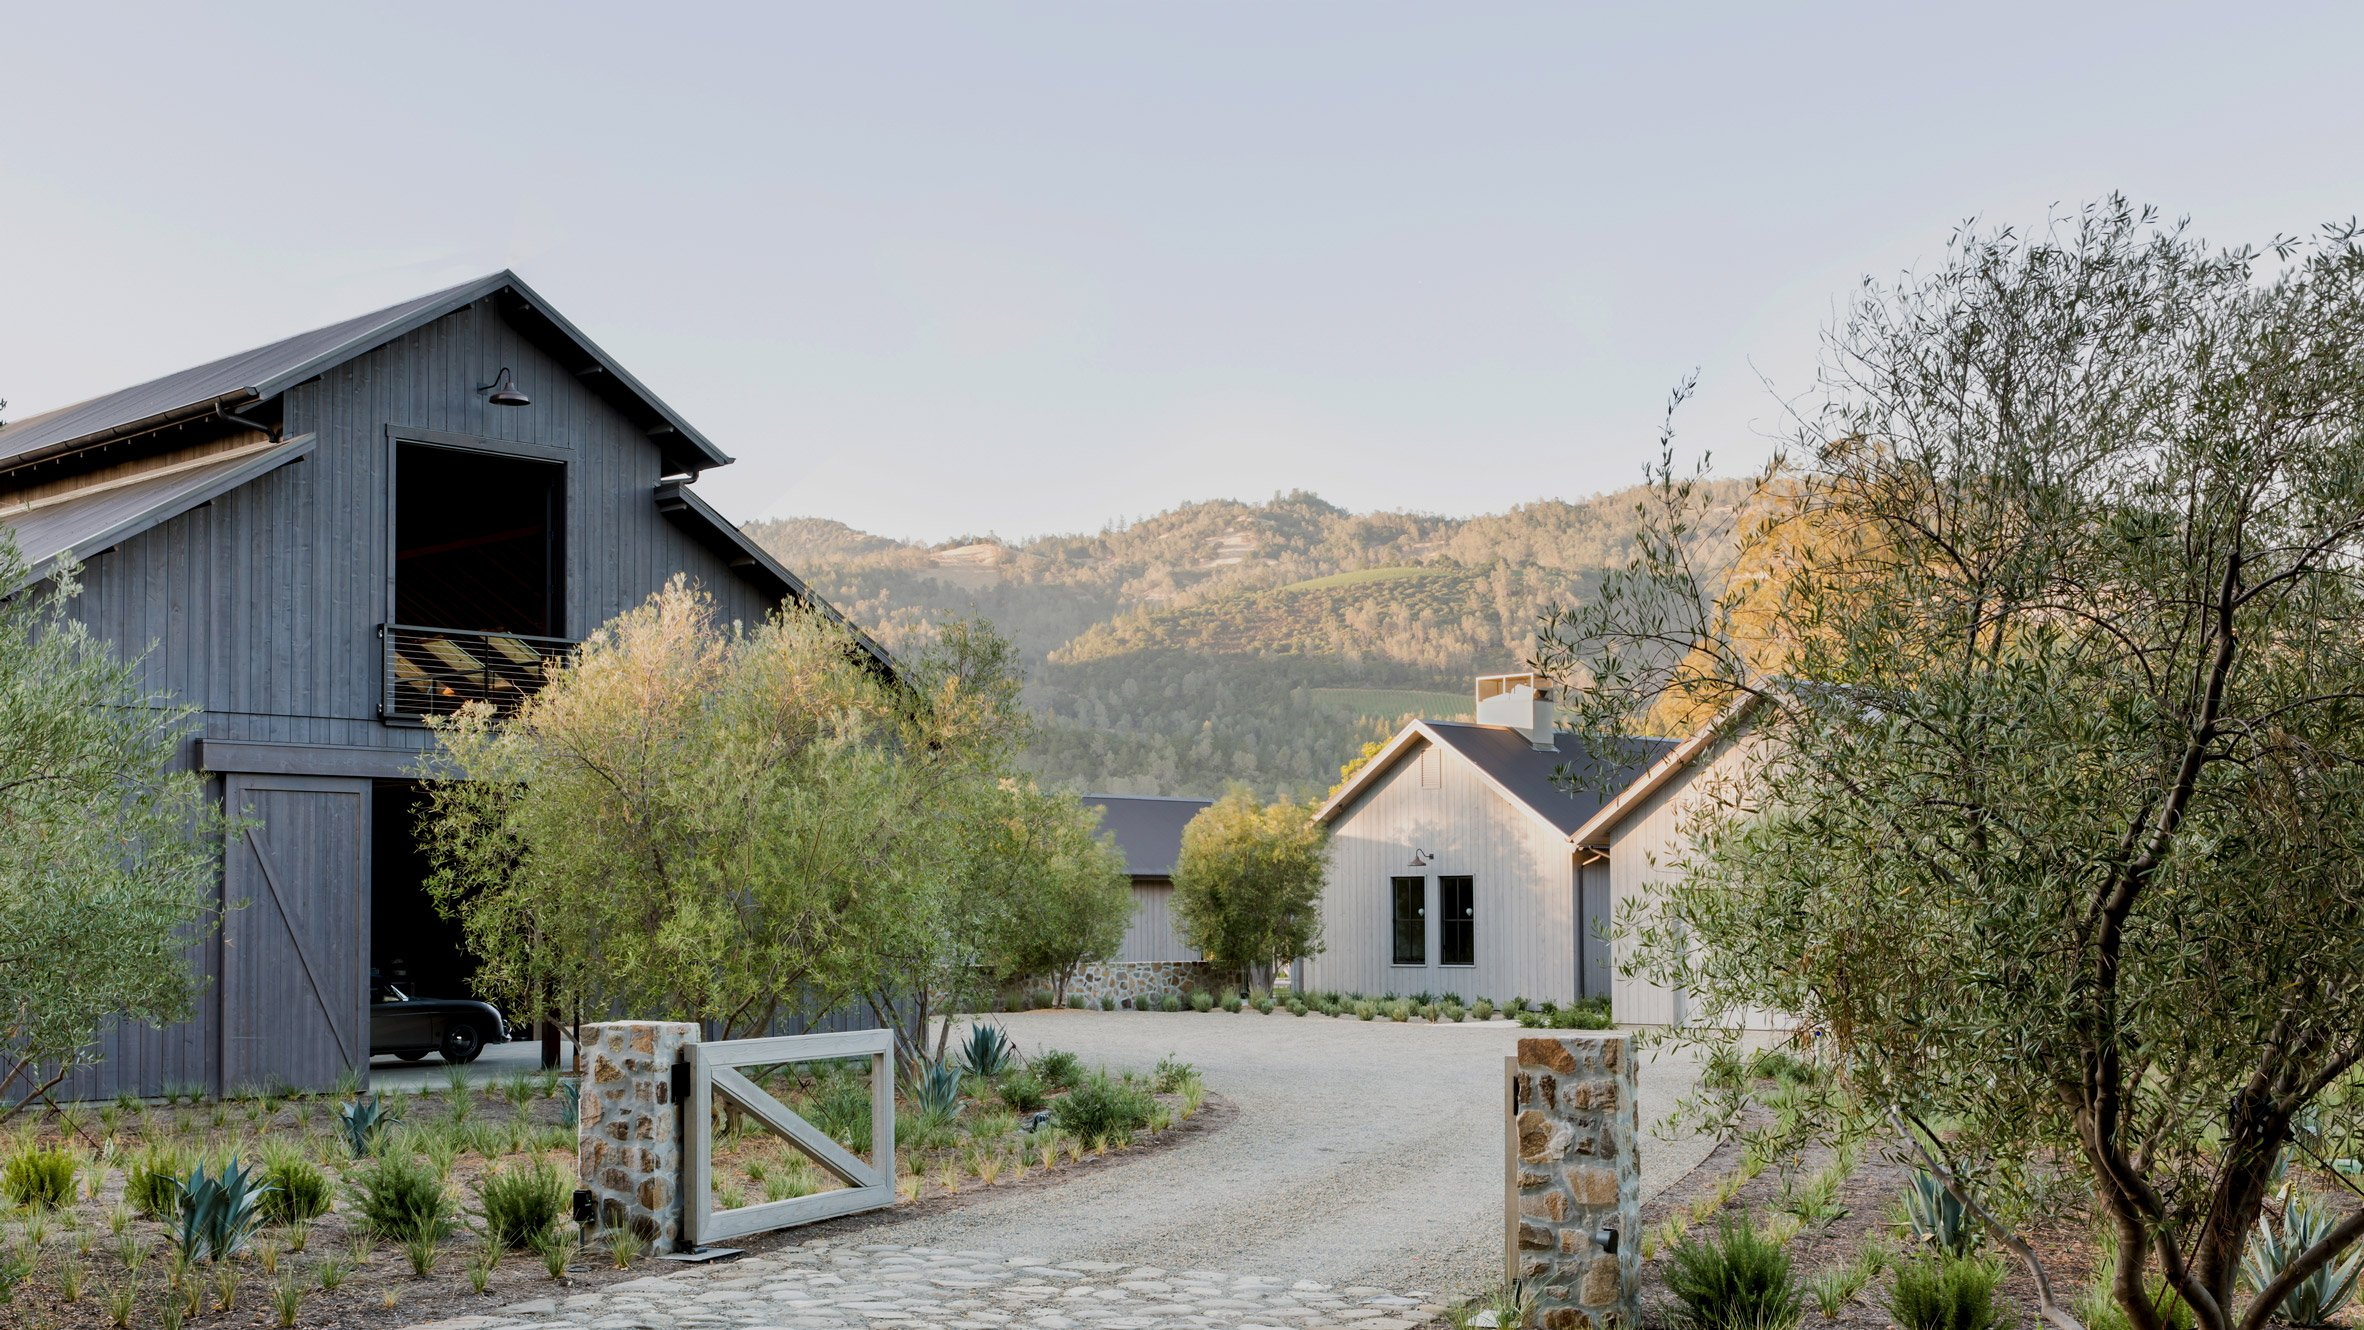 Calistoga Residence in Napa Valley draws on local barns and ... on woodland house design, nipa house design, seaside house design, sea ranch house design, joshua tree house design,